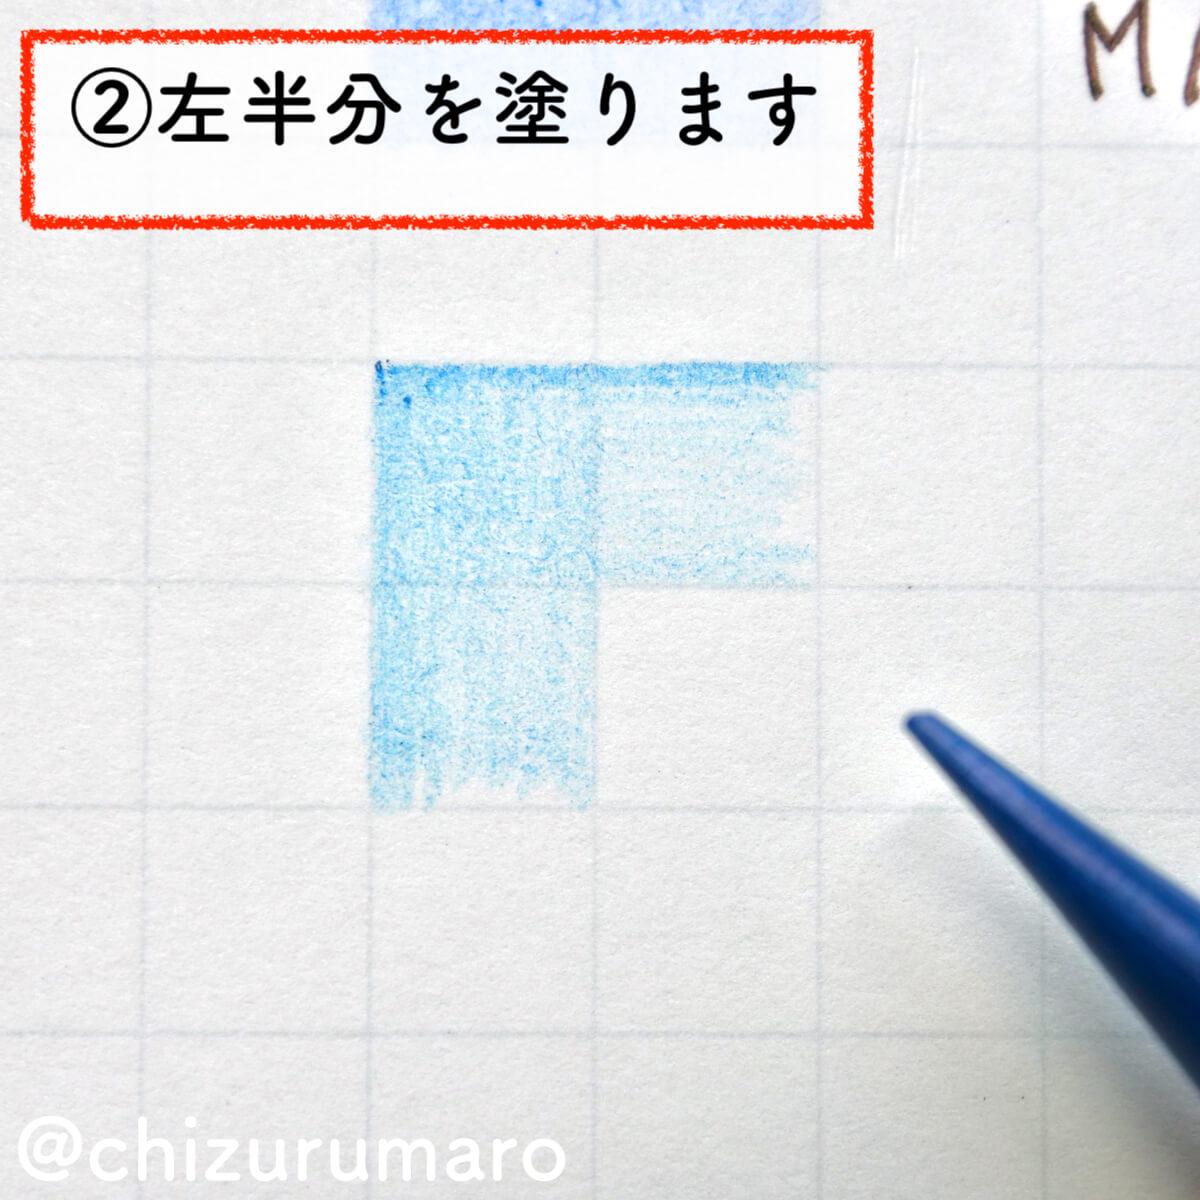 f:id:chizurumaro:20200921220028j:plain